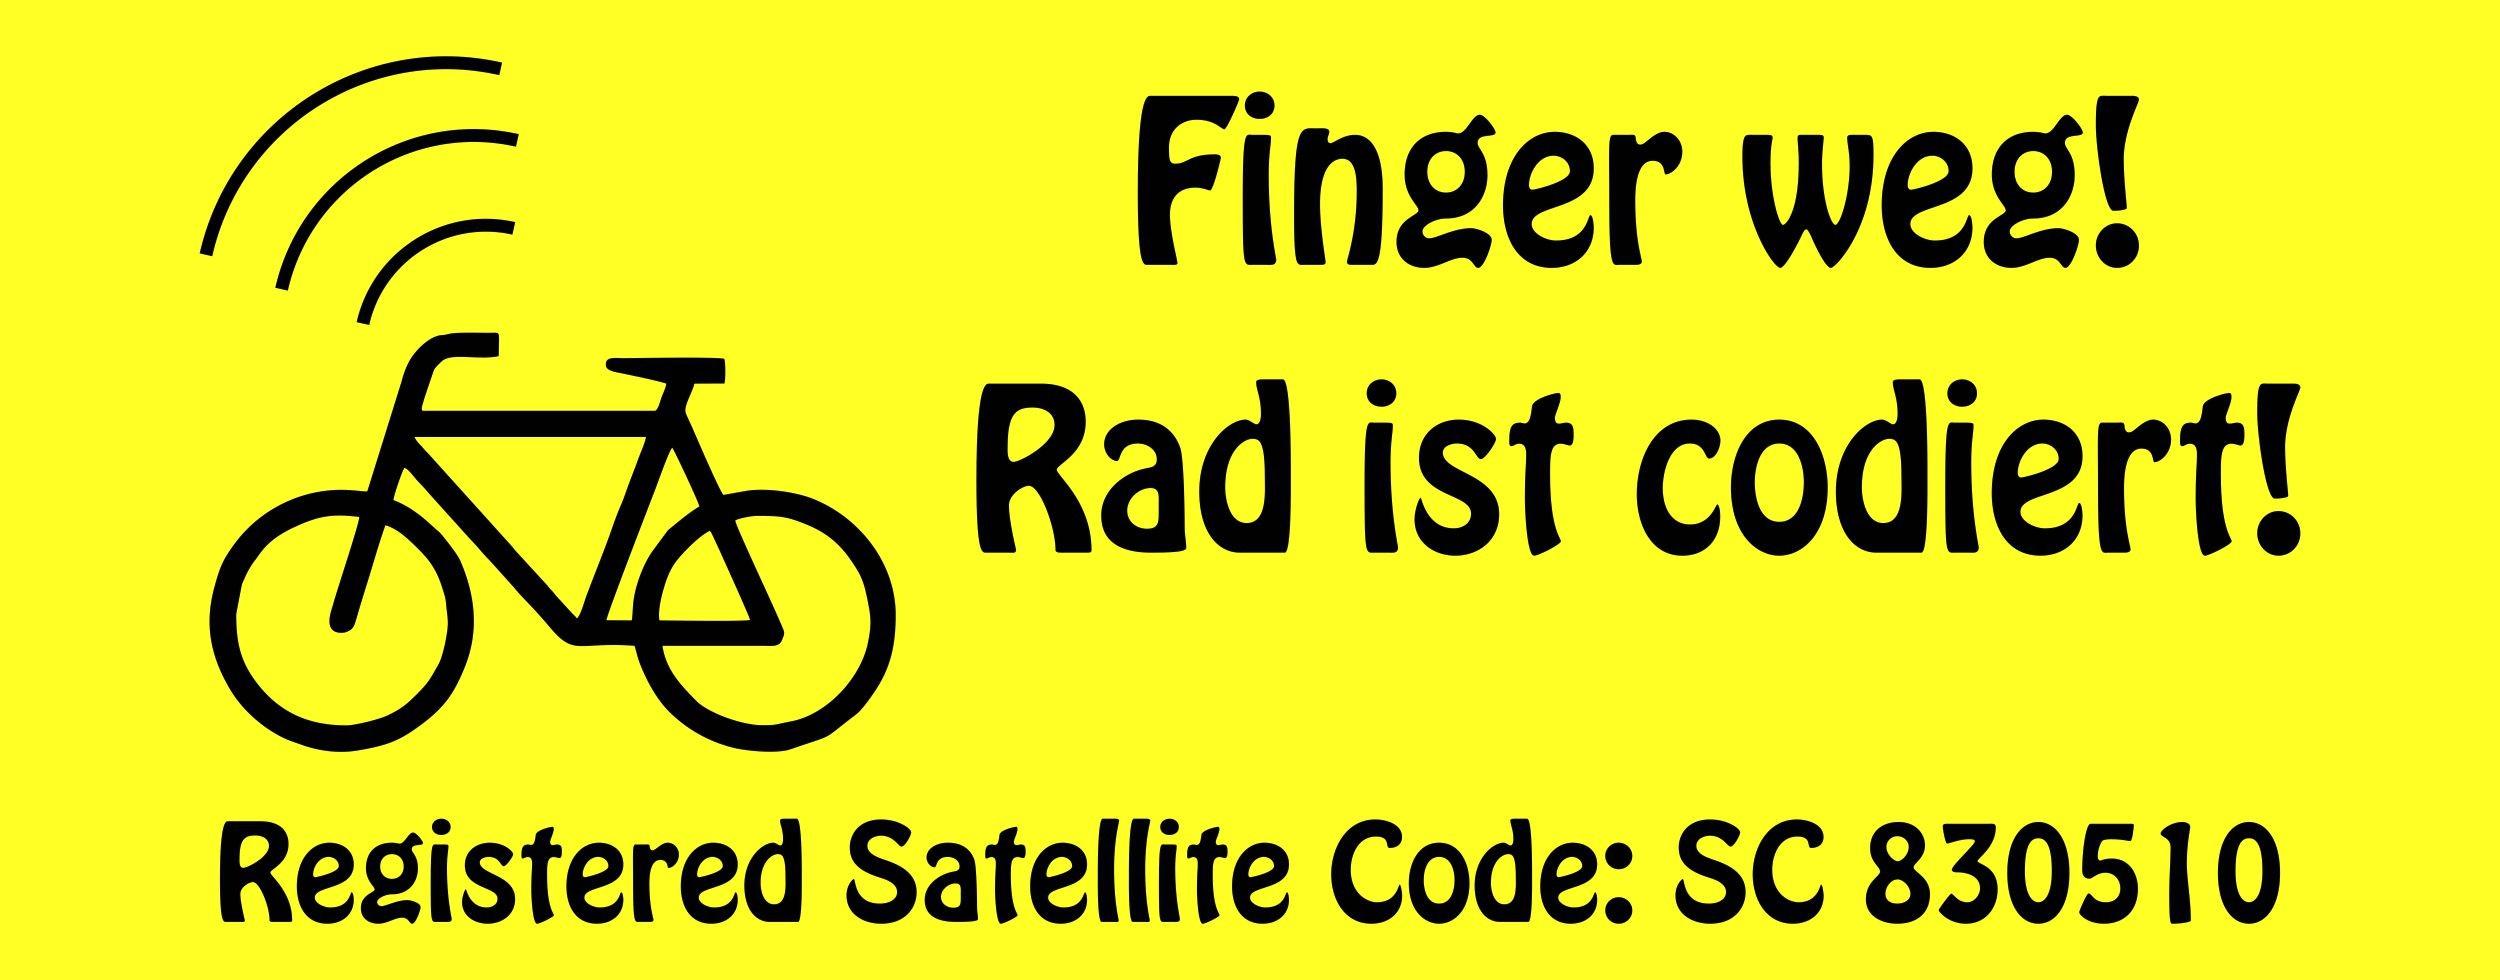 Aufkleber Finger weg! Rad ist codiert! Registered Satellite: SC 830510 gelb – Bild 1